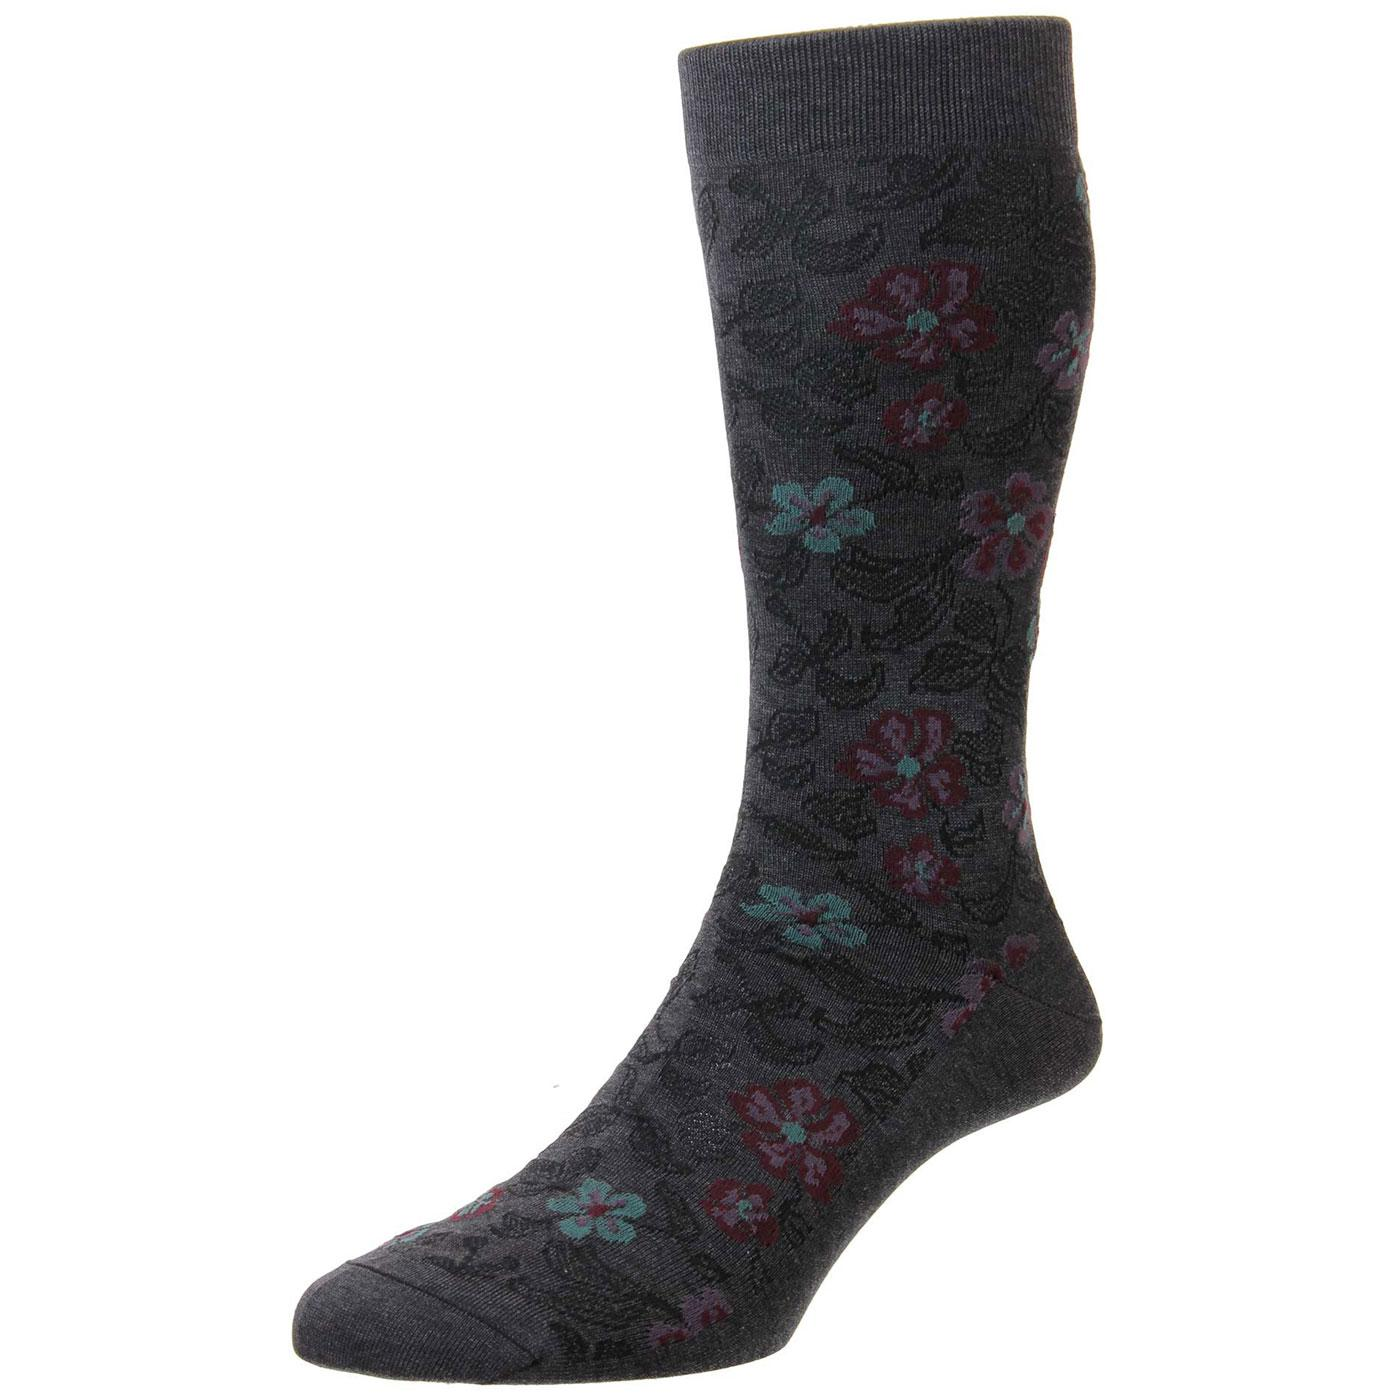 + Farren PANTHERELLA Men's Vintage Floral Socks DG